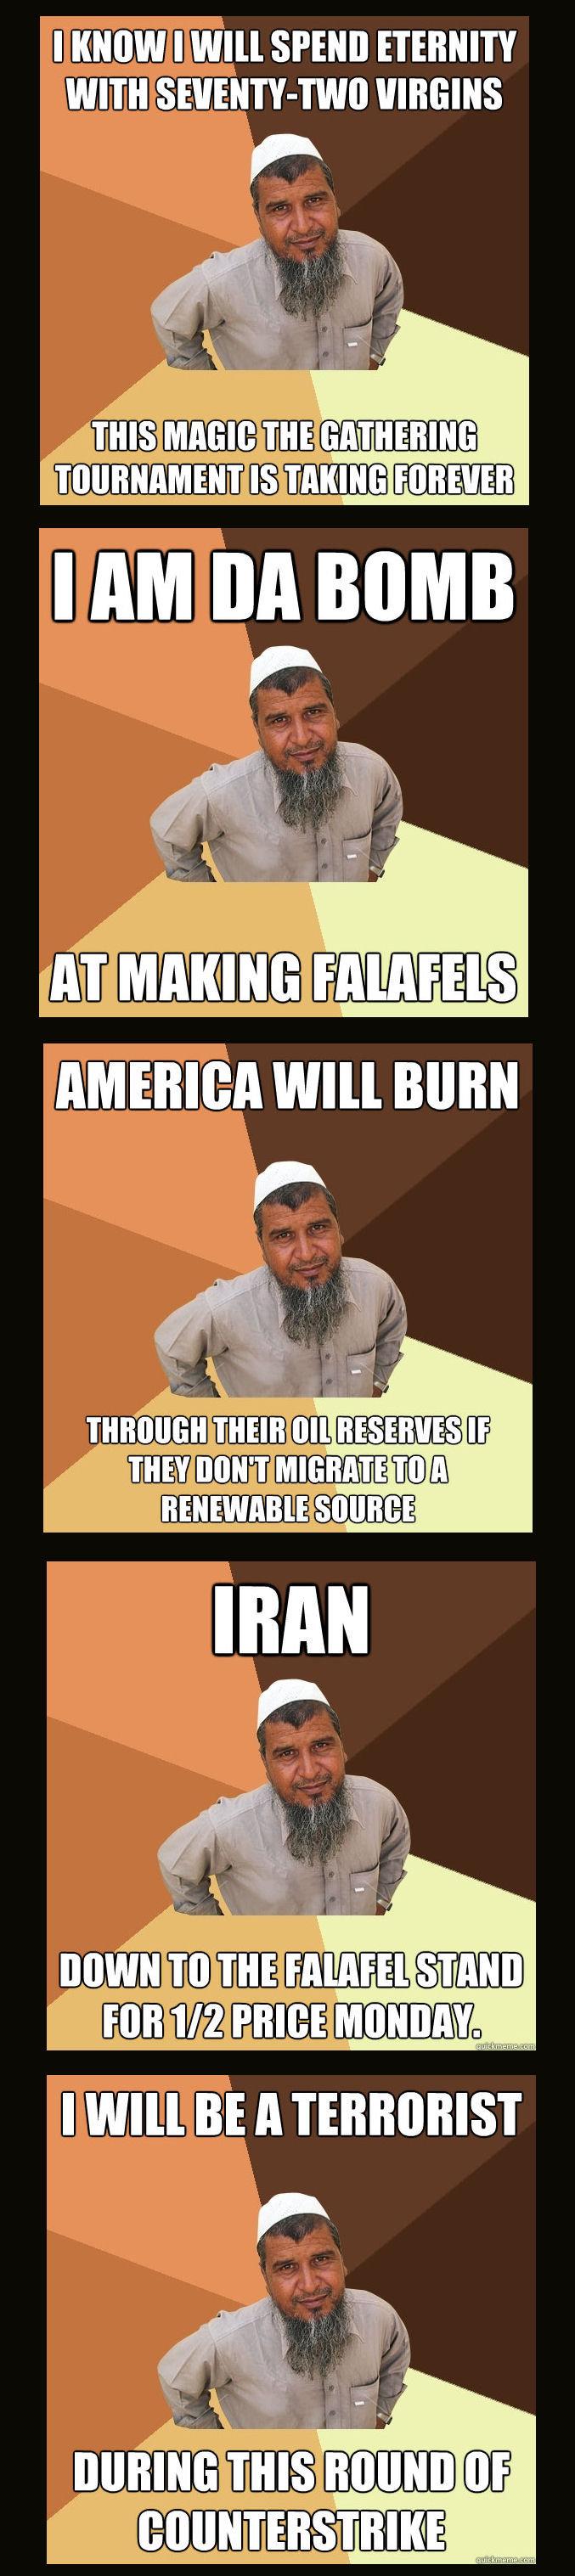 Ordinary Muslim Man Comp 2. part 1 funnyjunk.com/funny_pictures/1853057/Ordinary+Muslim+Man+Meme/ part 3 is up! funnyjunk.com/funny_pictures/1857674/Ordinary+Mu muslim man meme